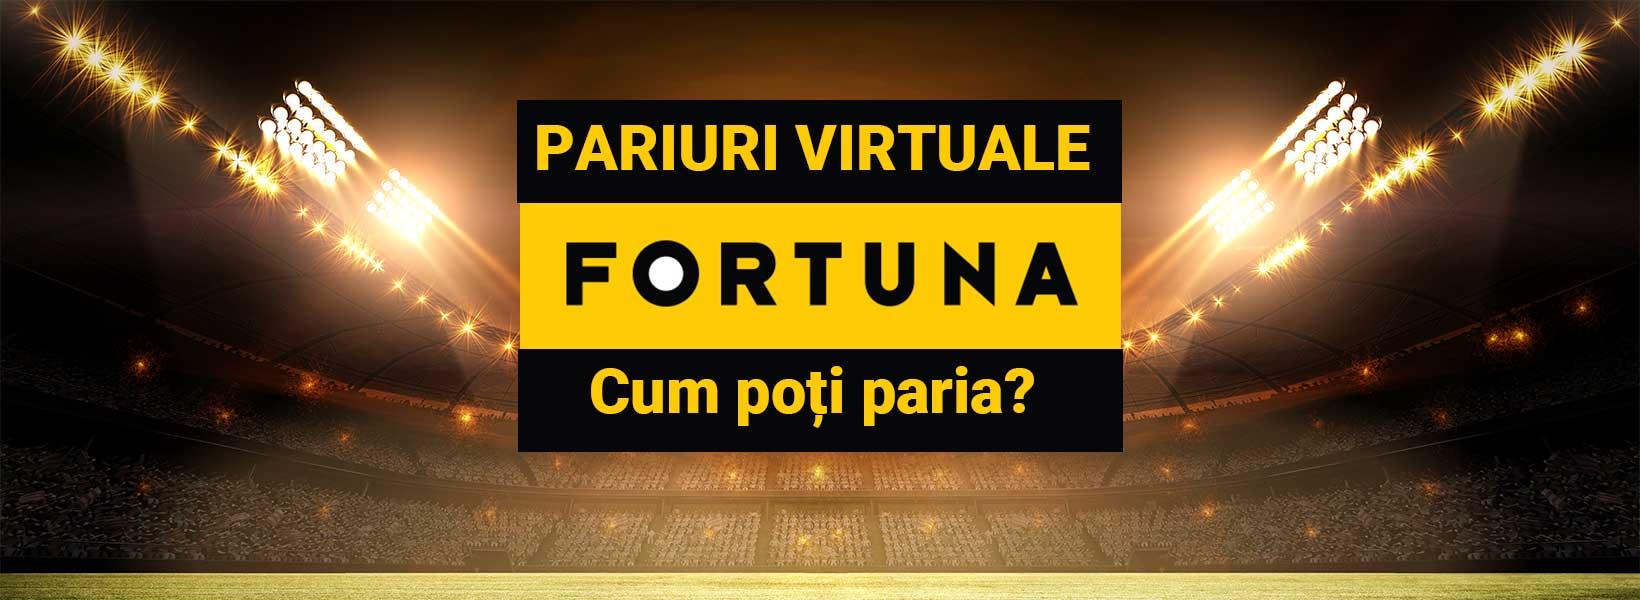 pariuri virtuale efortuna